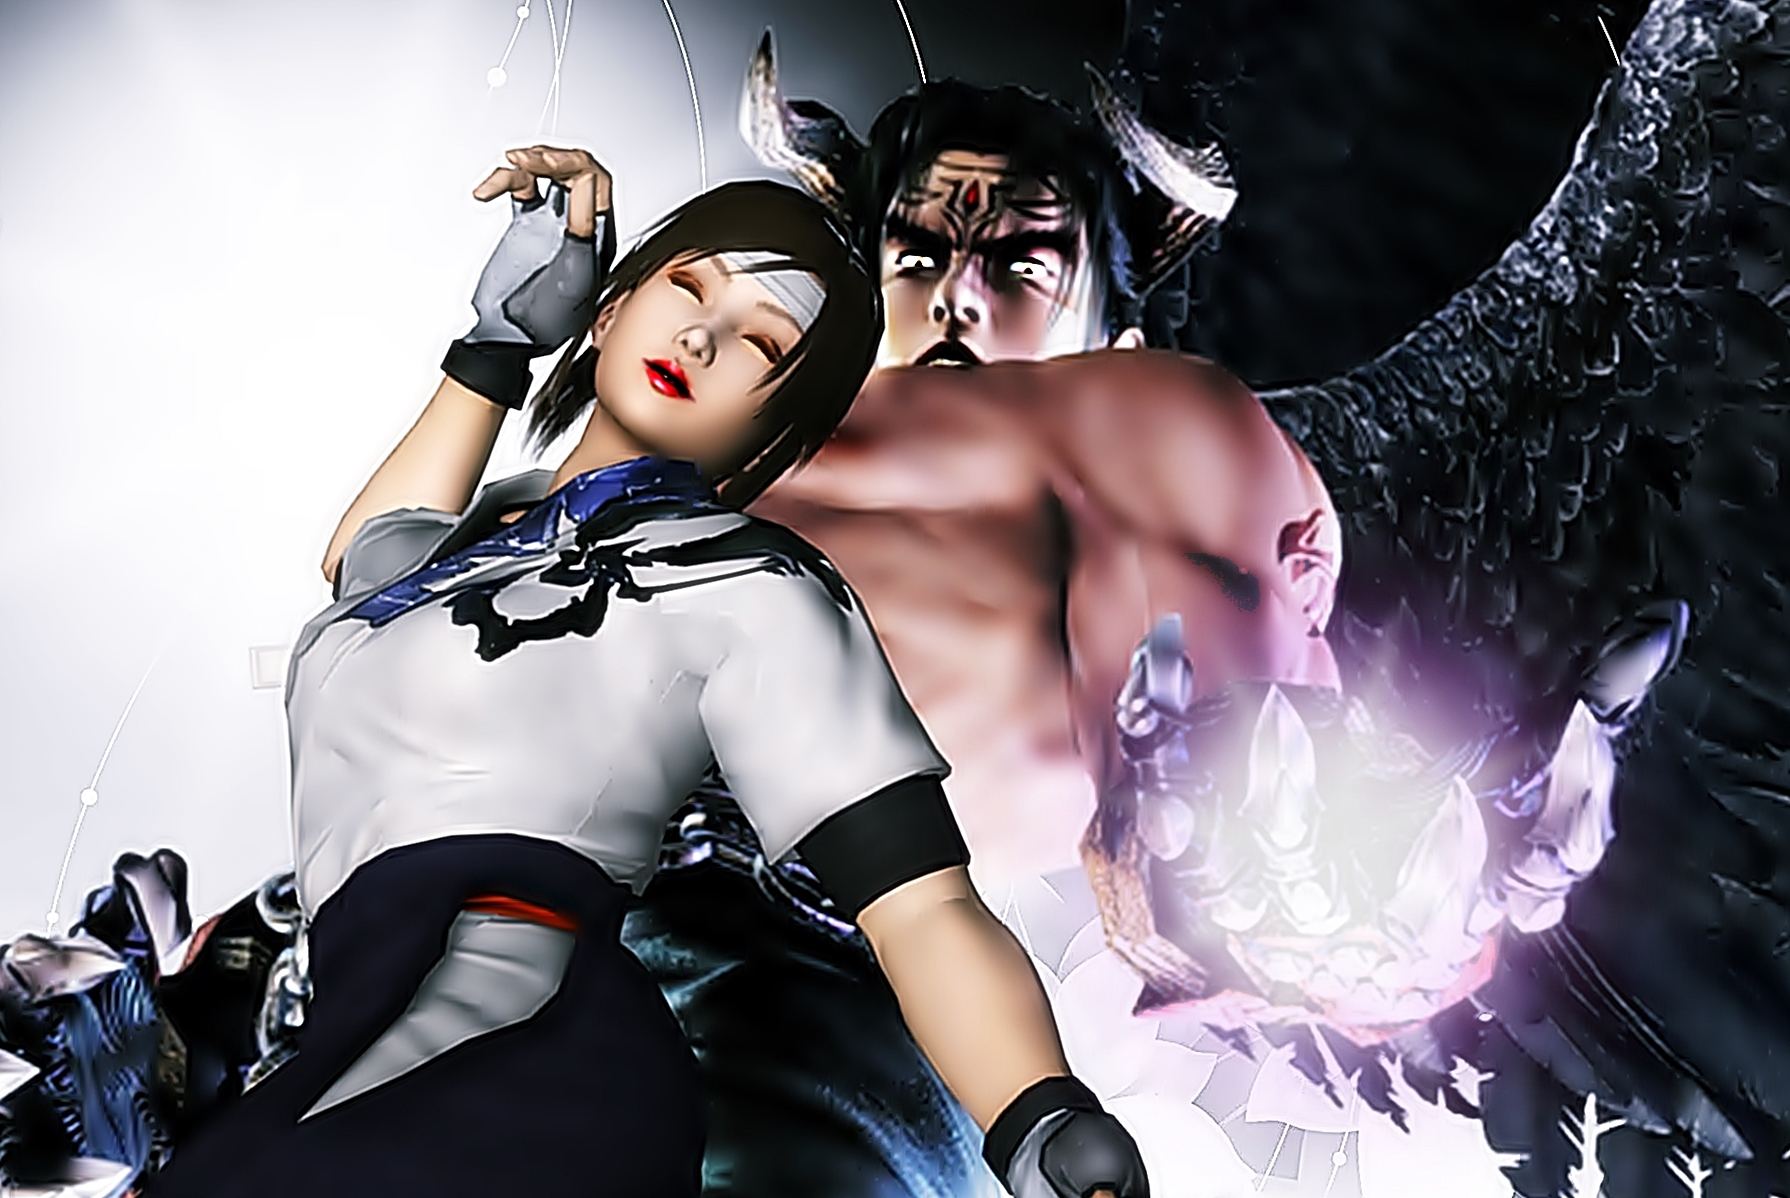 jun and asuka relationship test